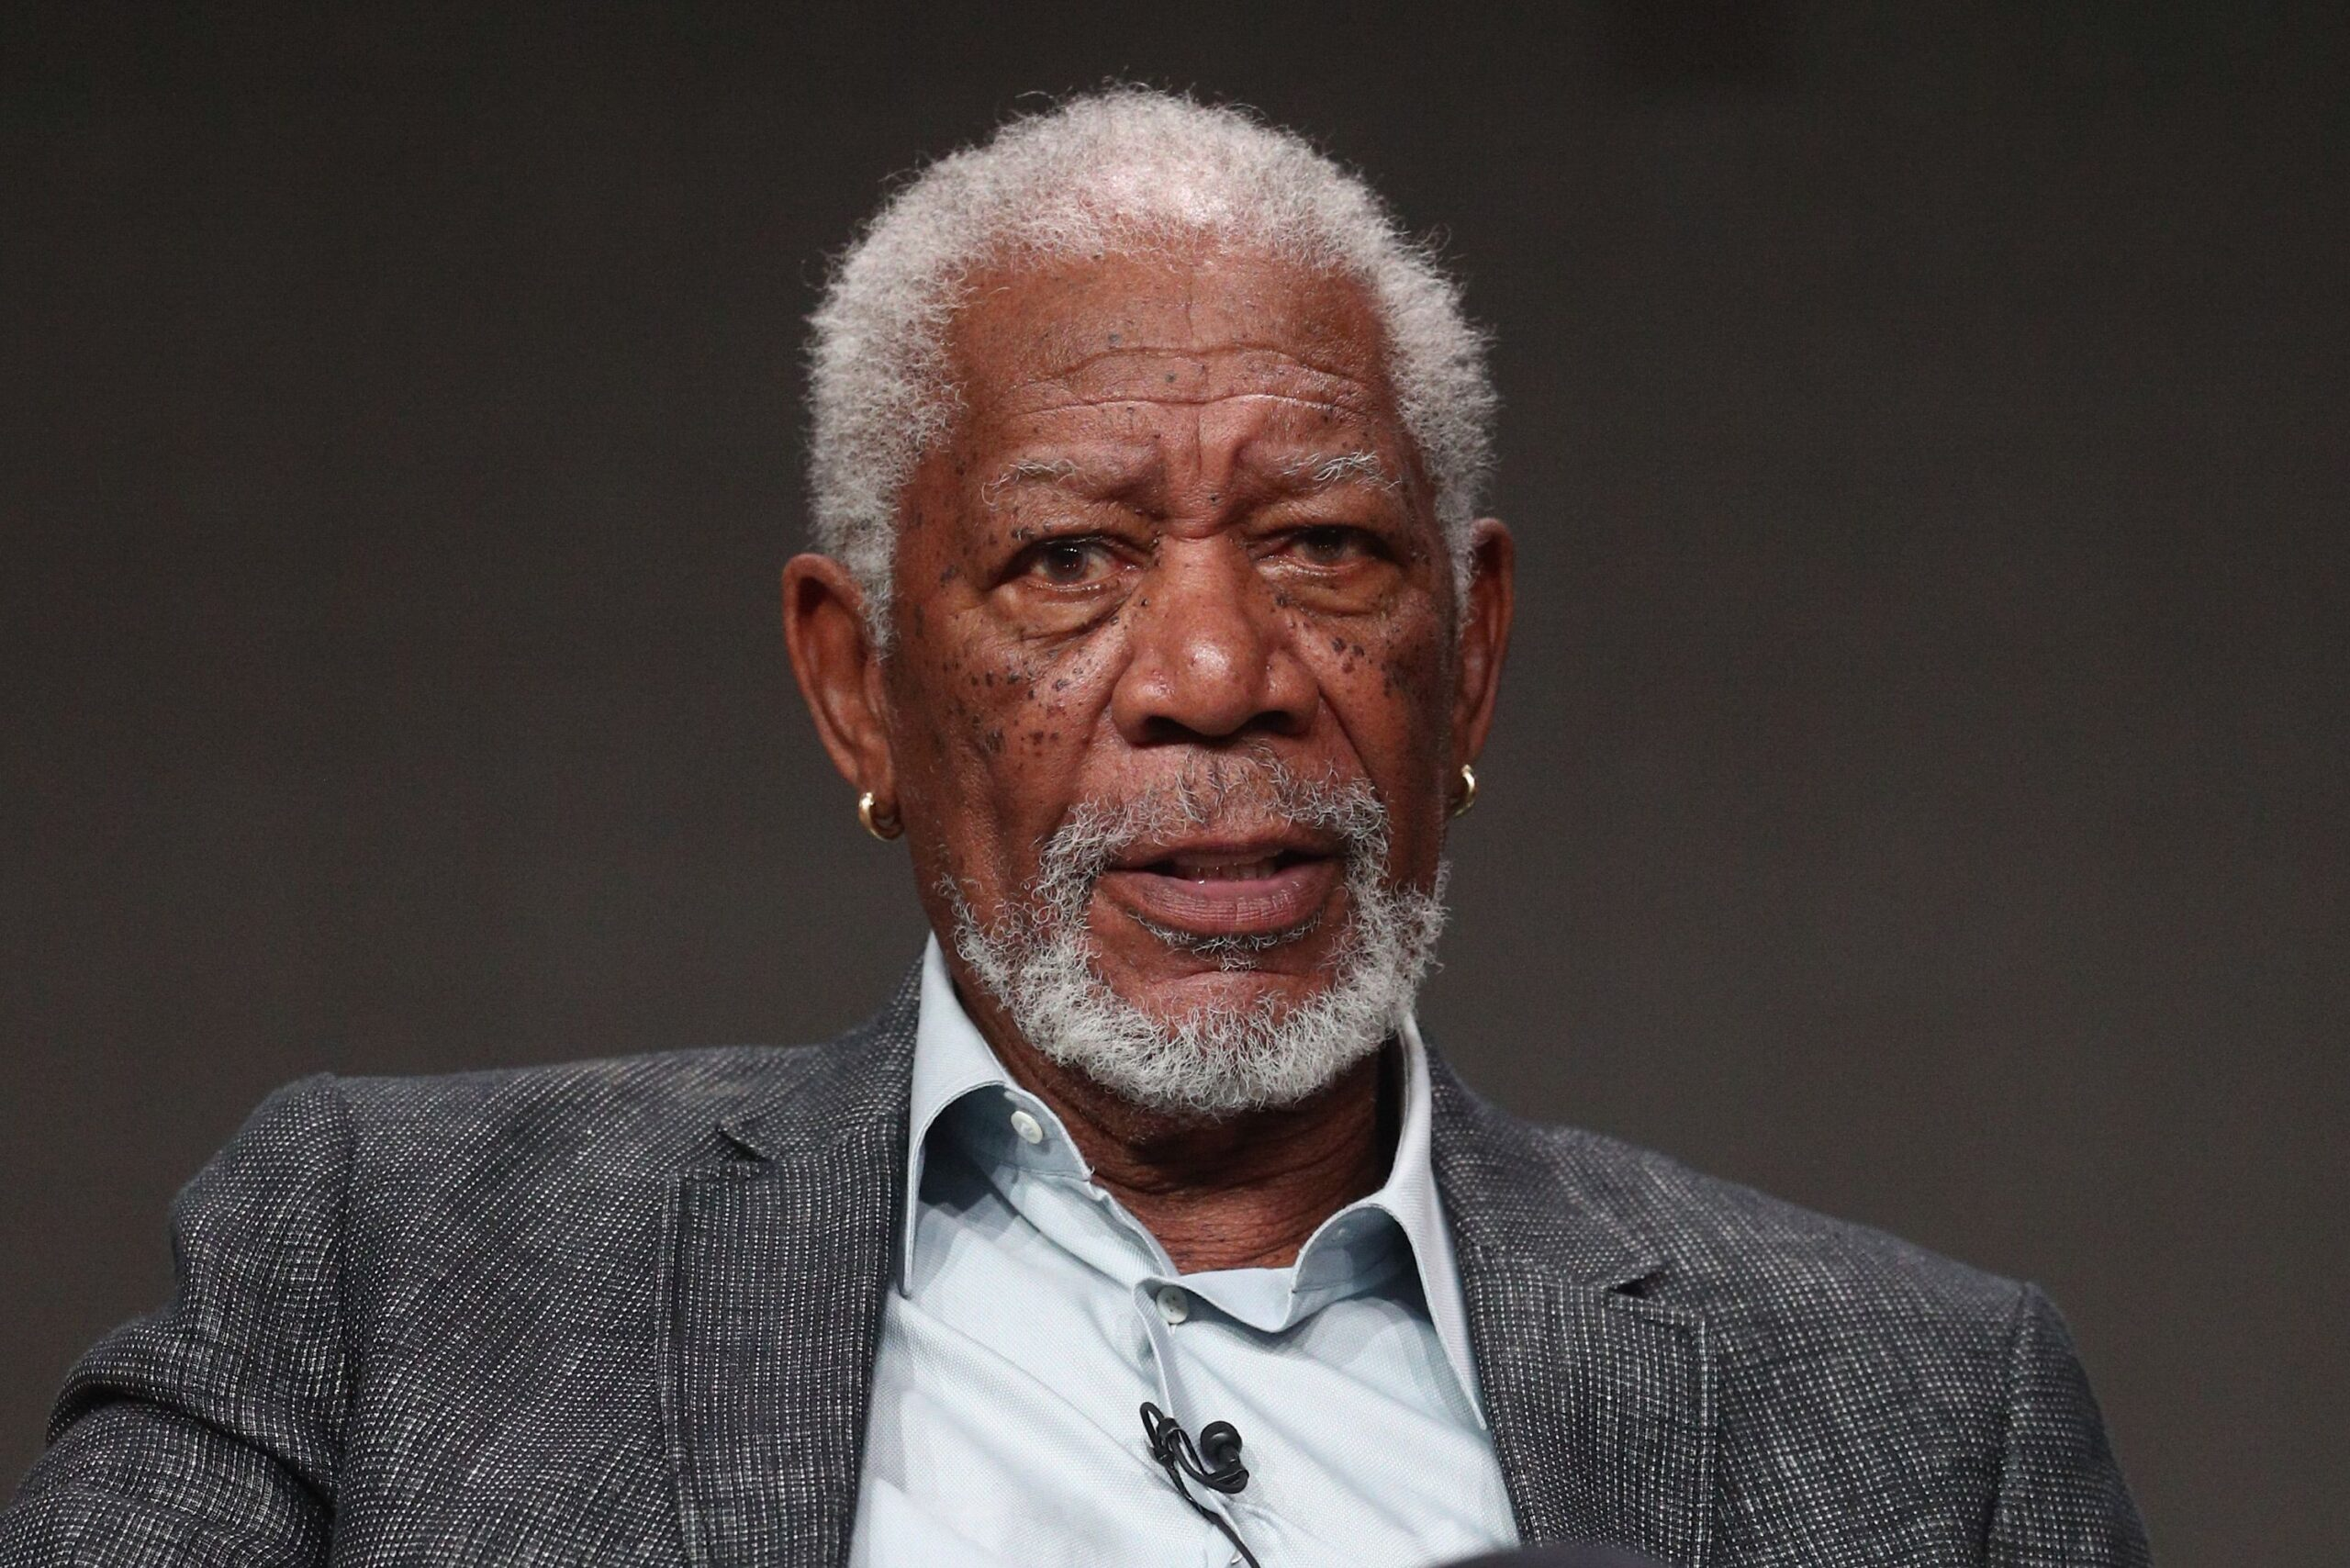 Morgan Freeman Biography, Facts & Life Story Updated 2021